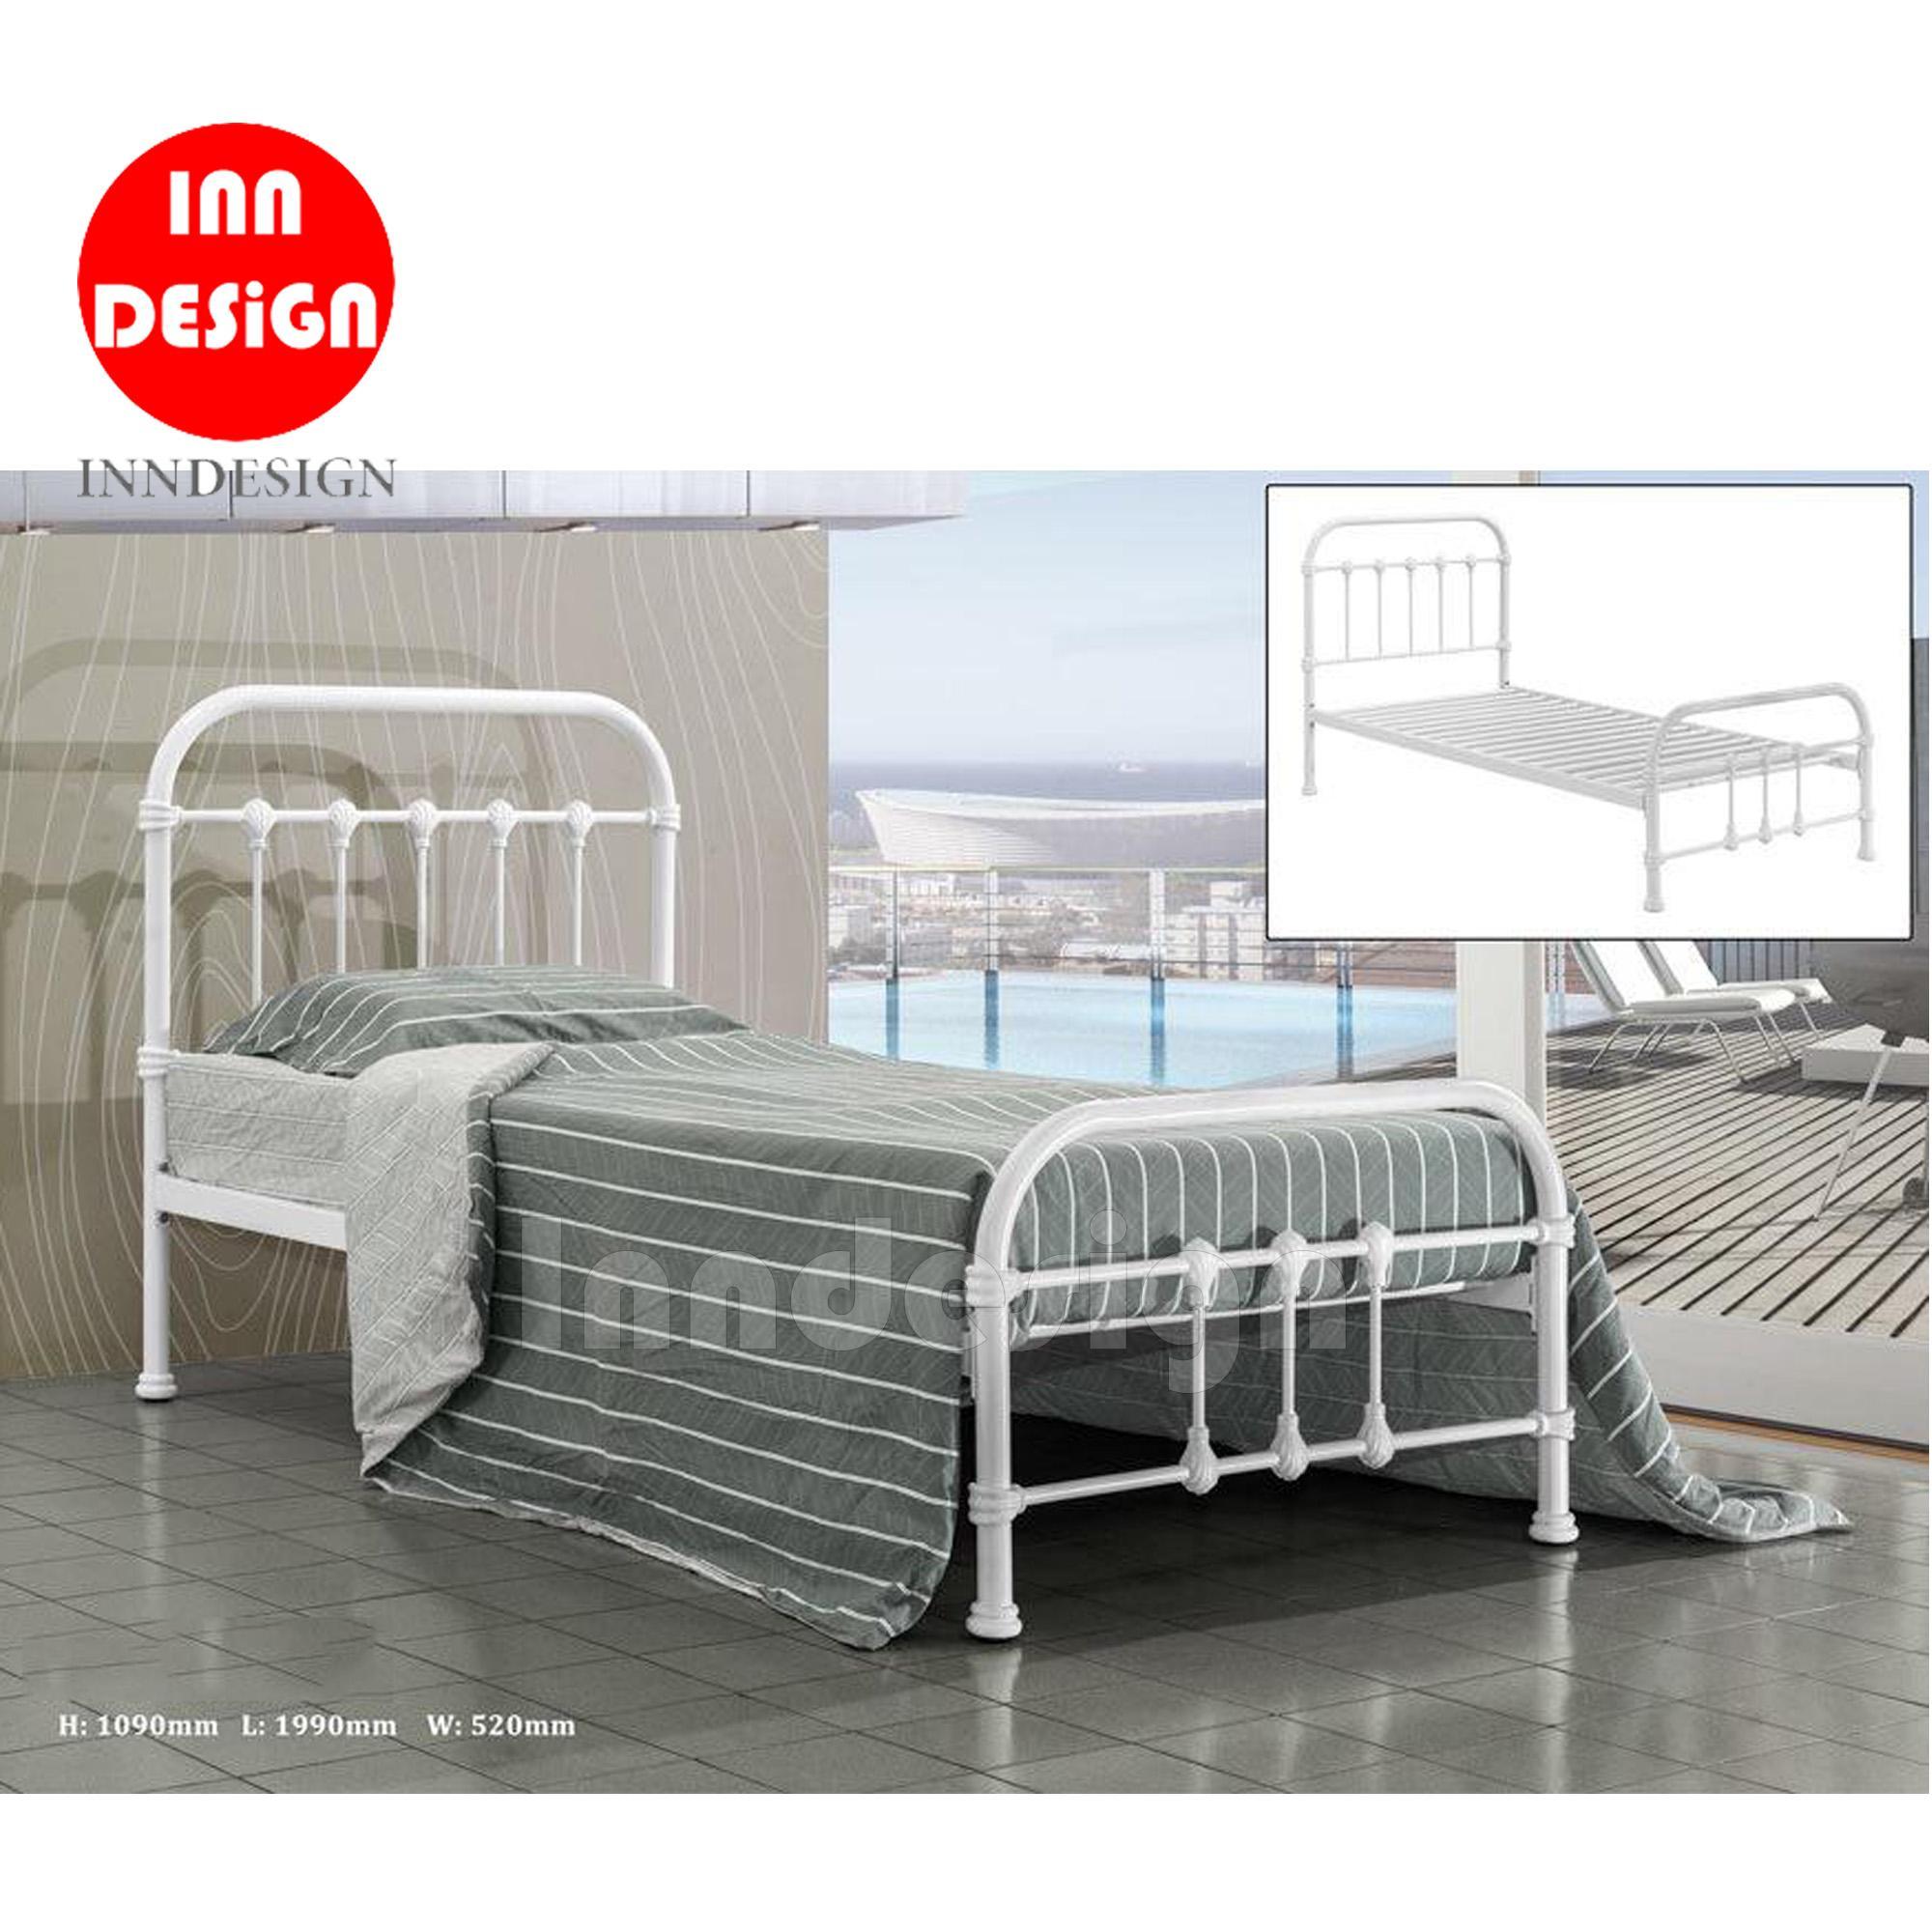 Single Metal Bed / Metal Bed Frame (White)